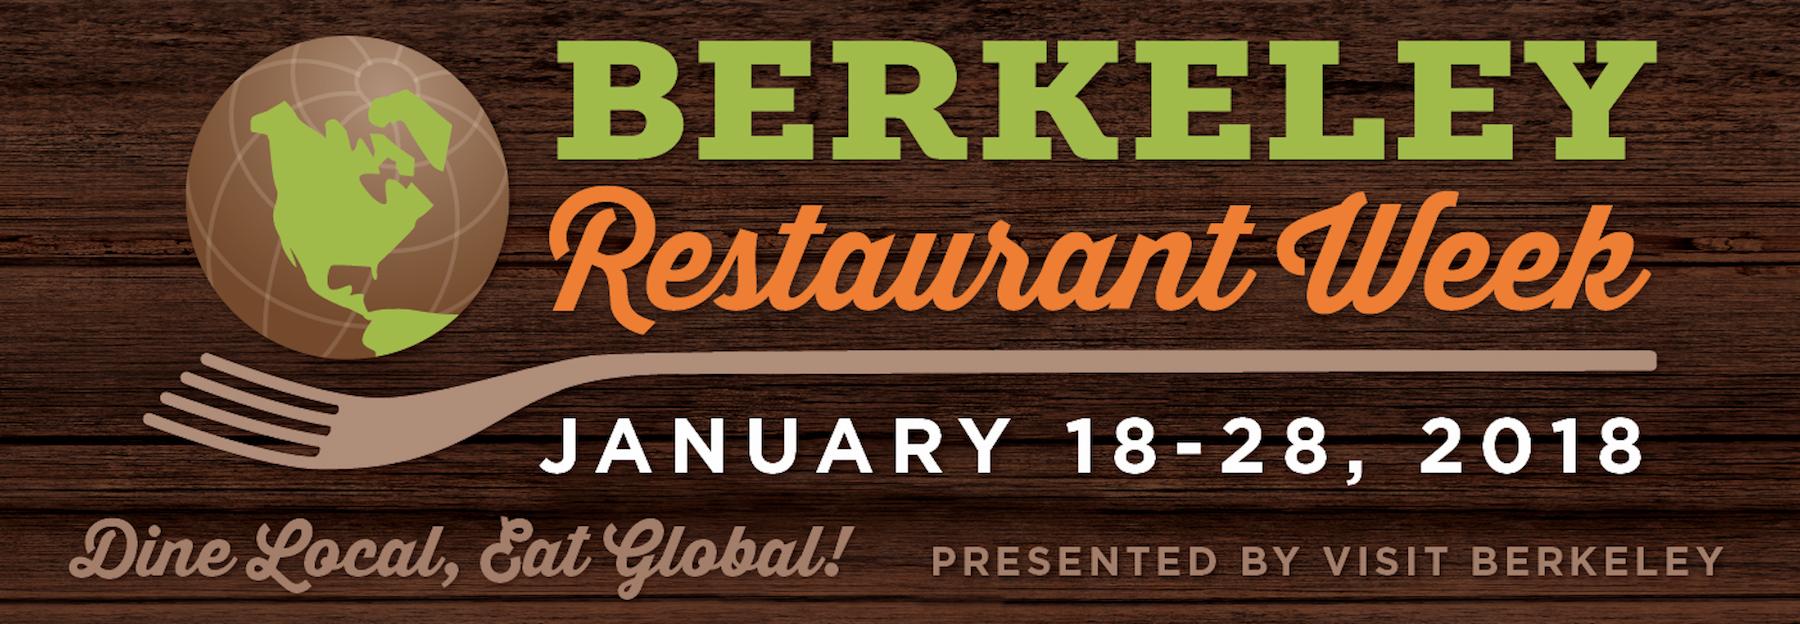 Berkeley Restaurant Week